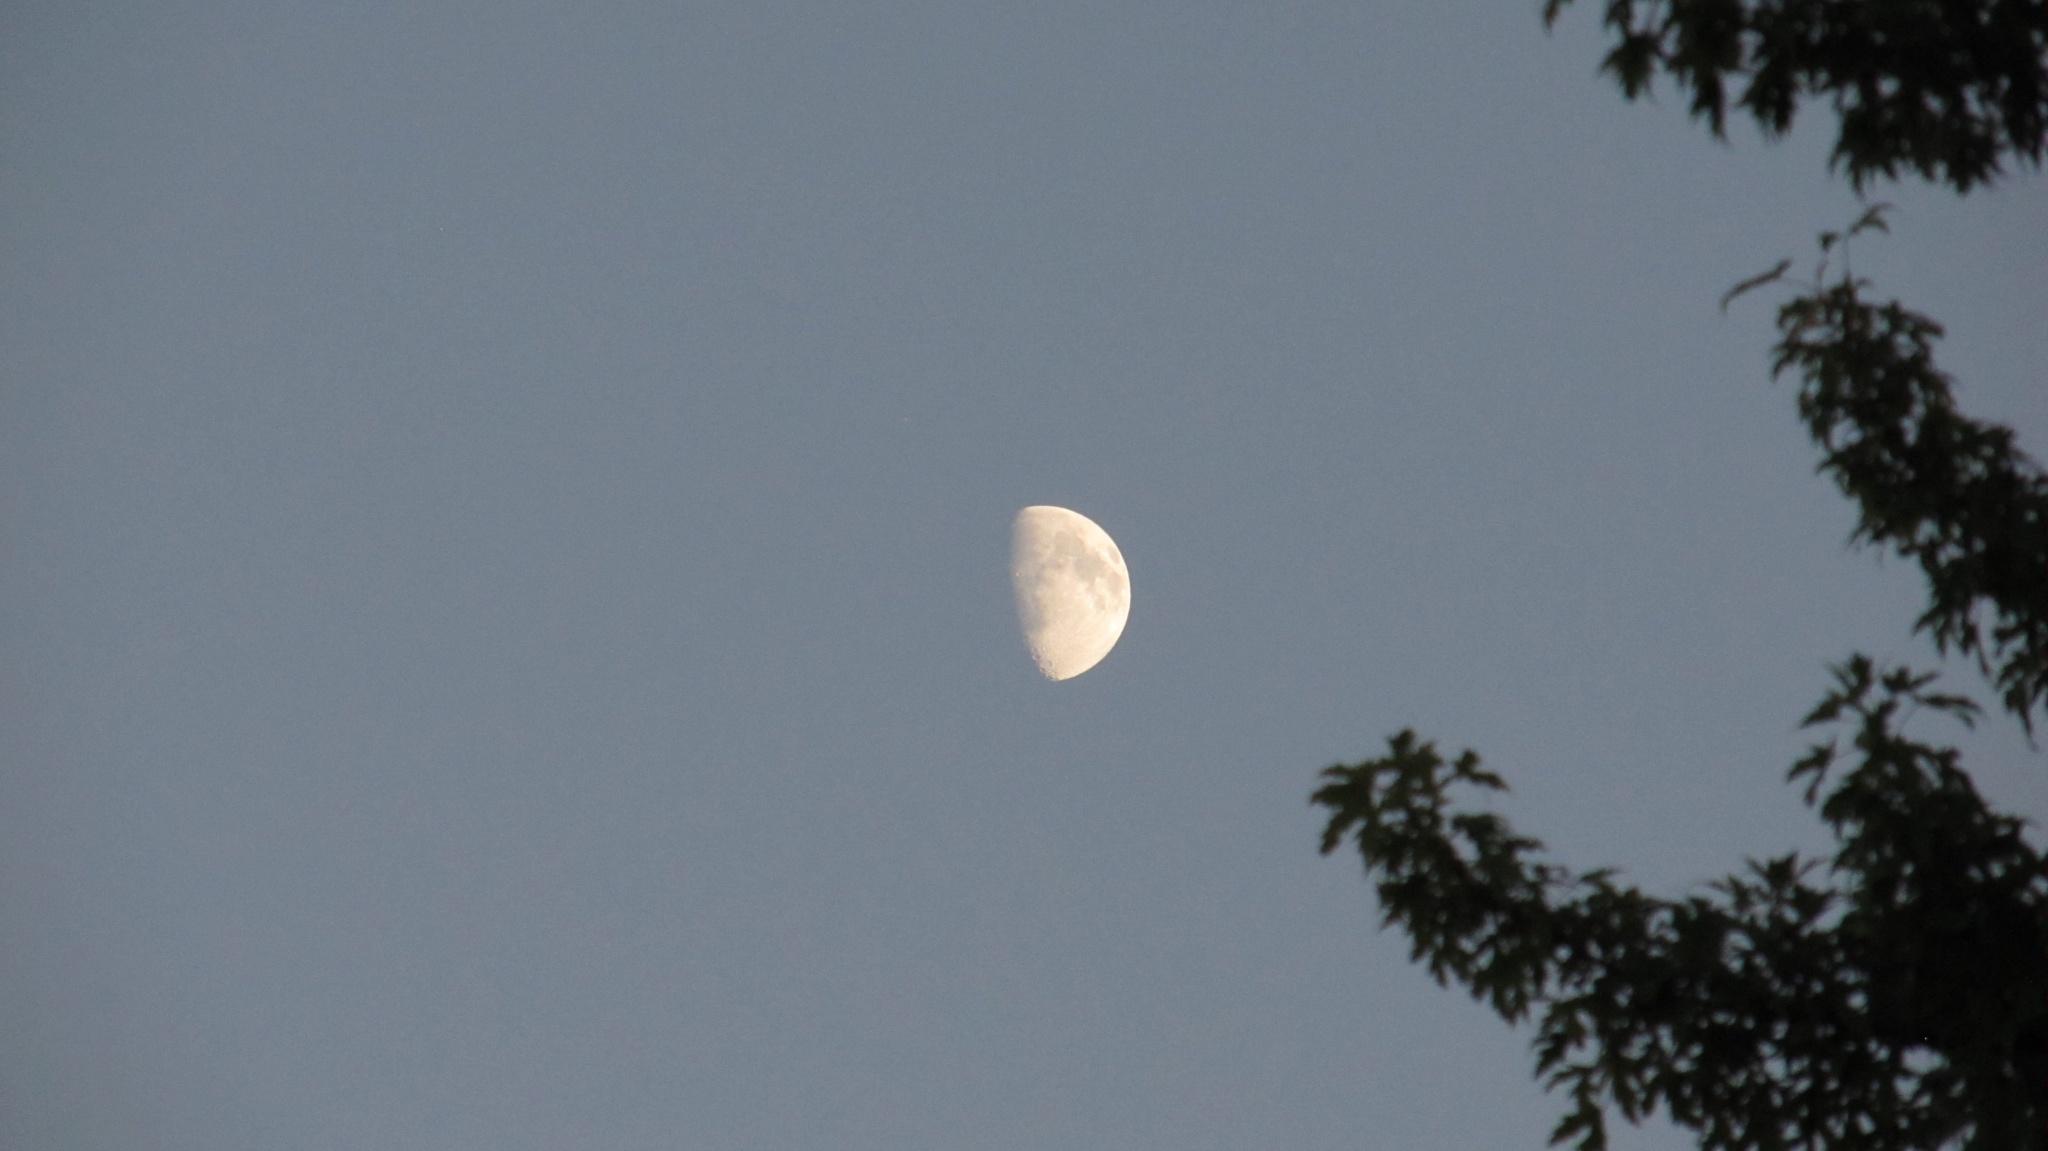 Half Moon 2 by simonp